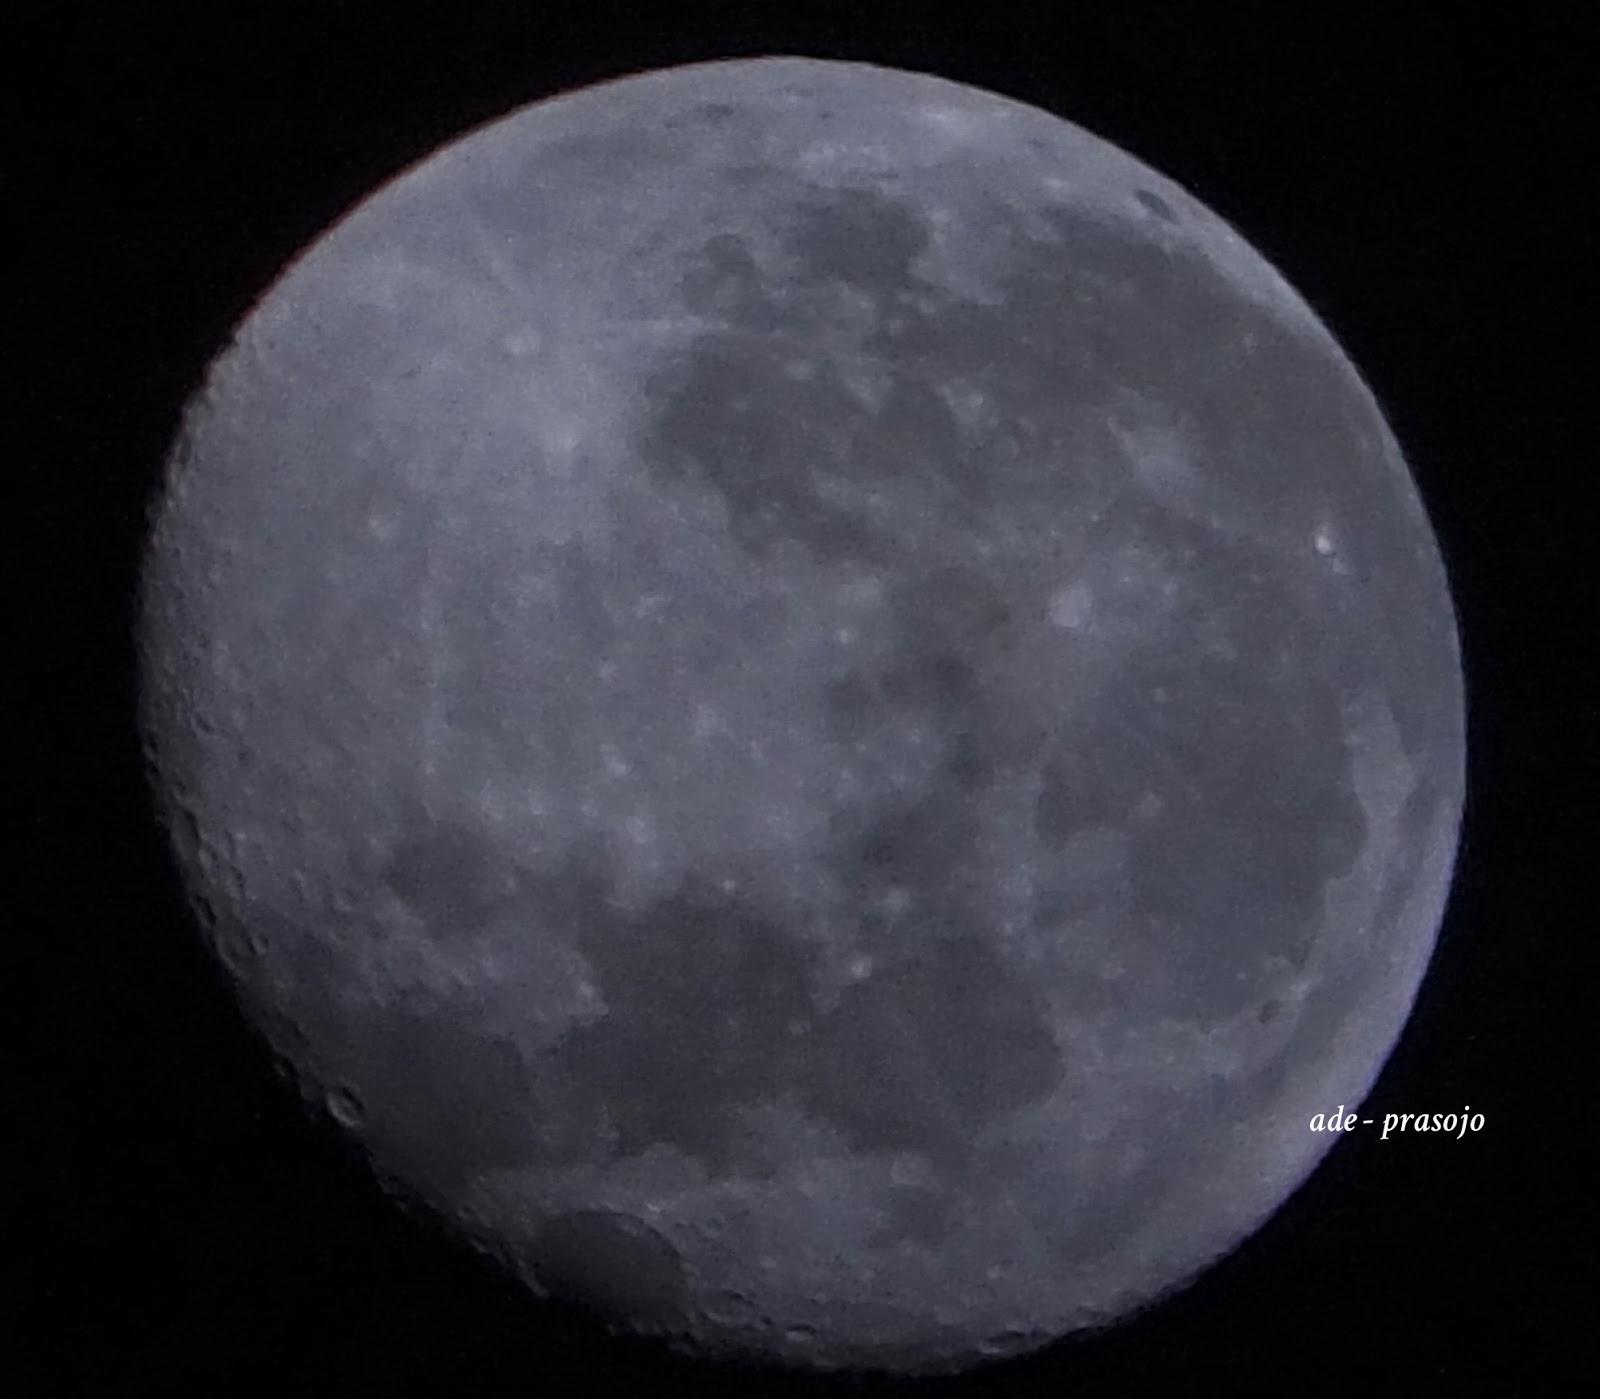 Indahnya Bulan di malam hari Full terekspos